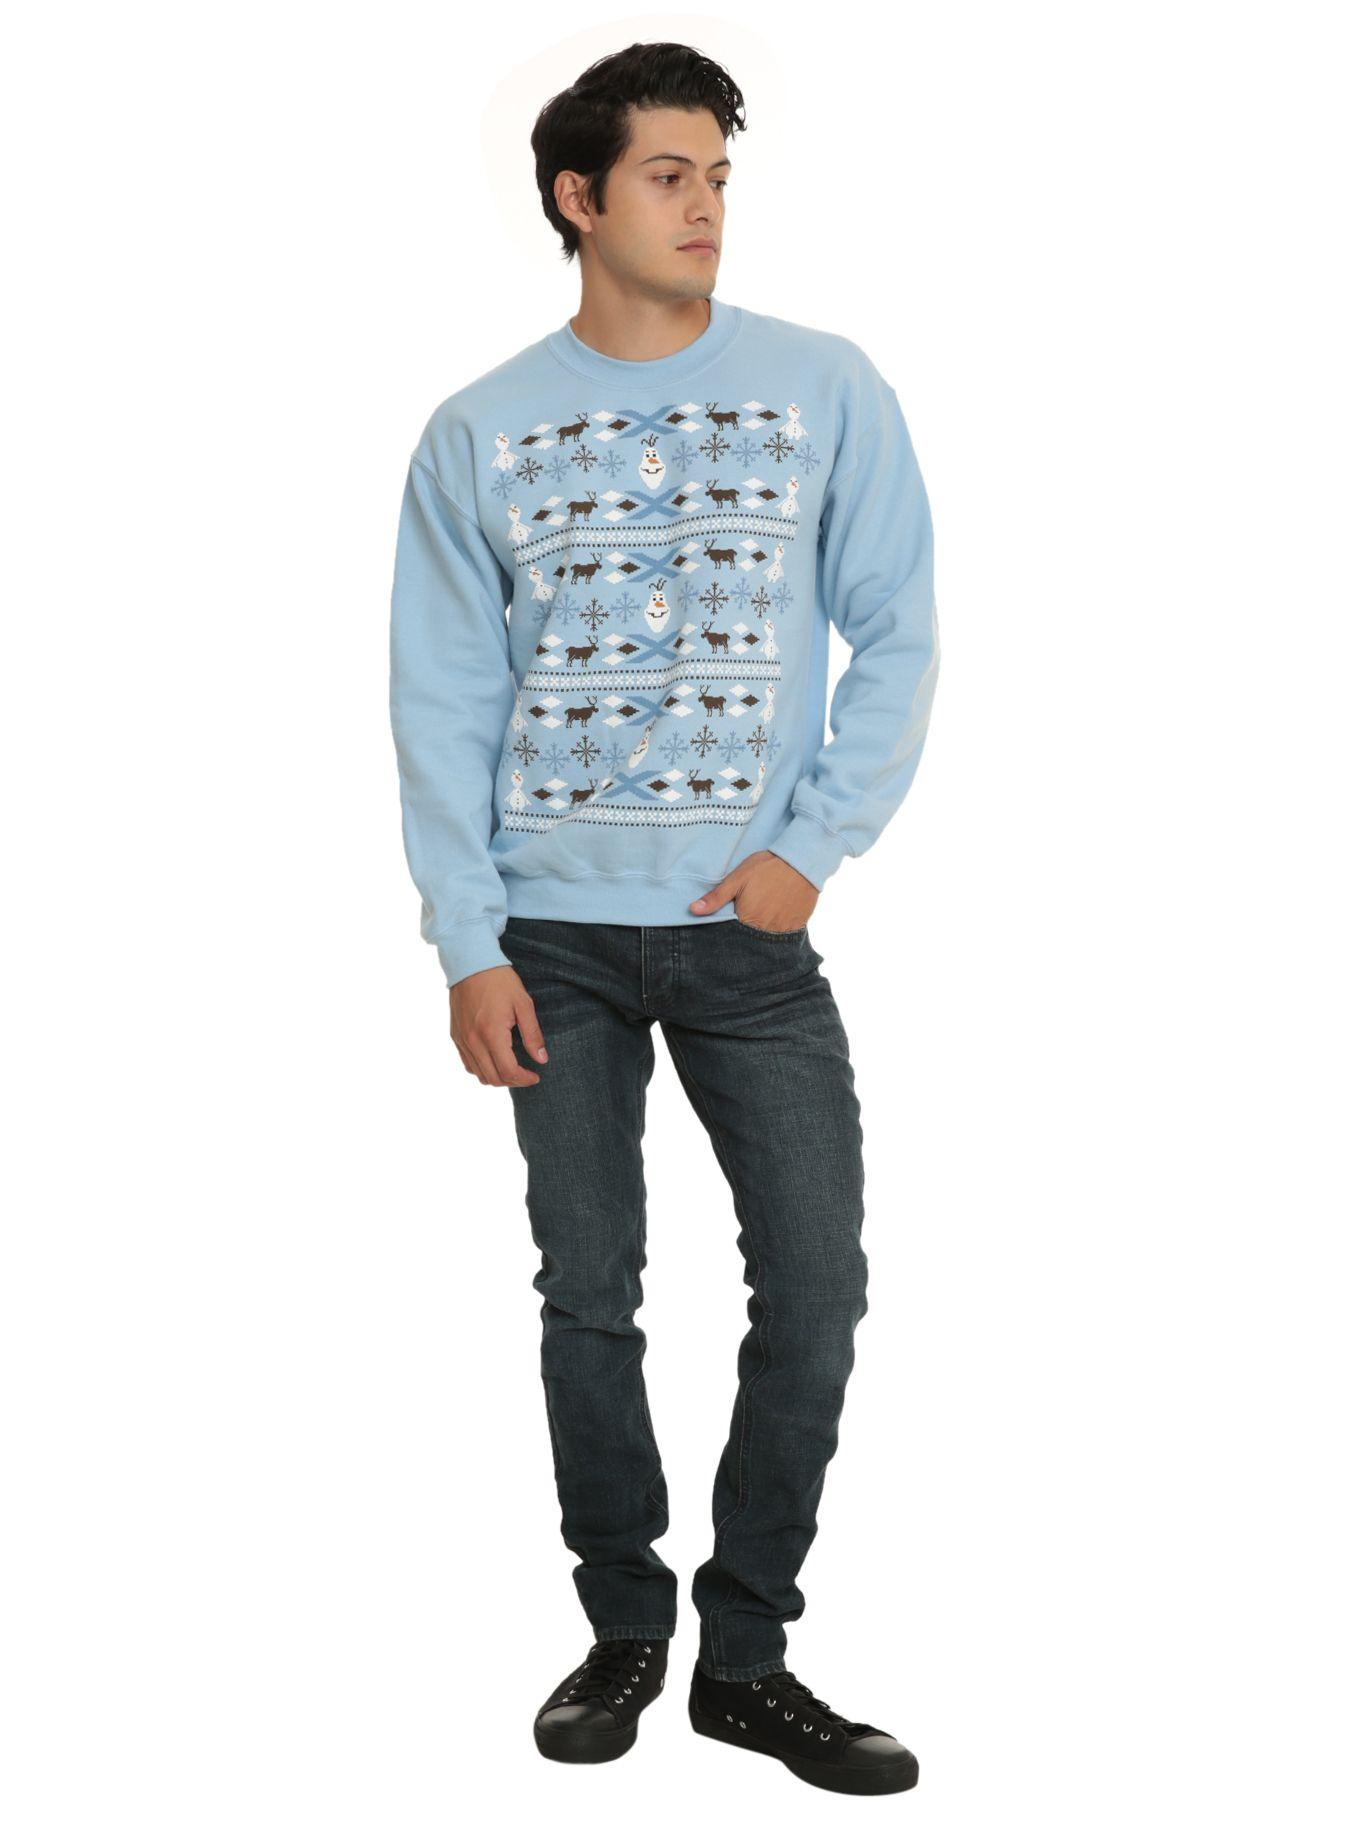 Disney Frozen Olaf Holiday Crewneck Sweatshirt | Hot Topic | Clothes ...